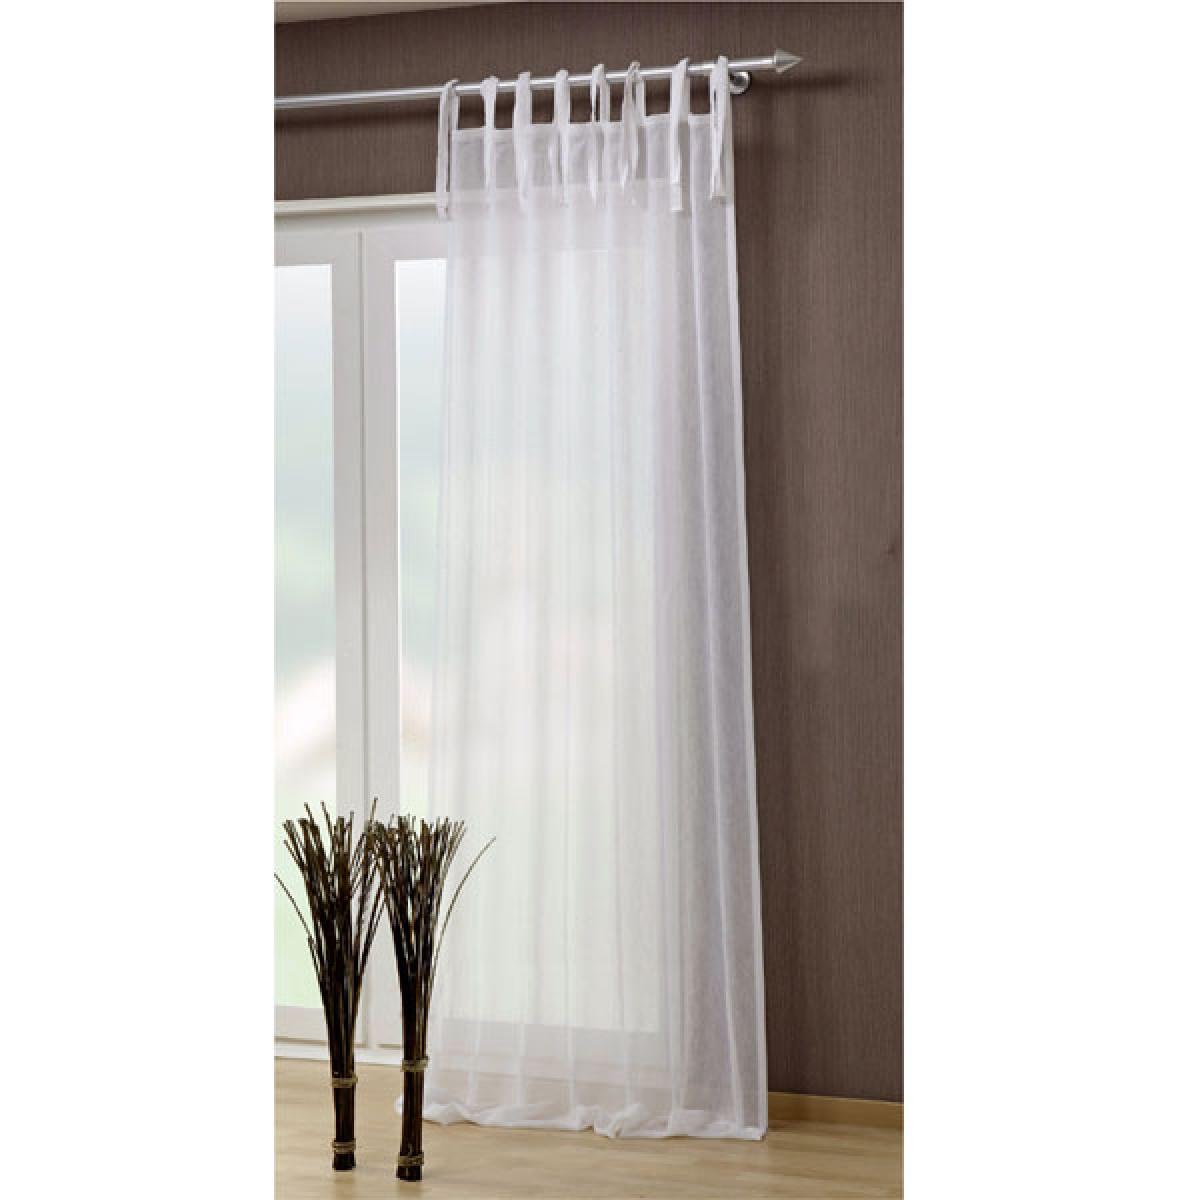 færdigsyede gardiner Færdigsyede gardiner med binde stropper   40441 801   (BxH  færdigsyede gardiner